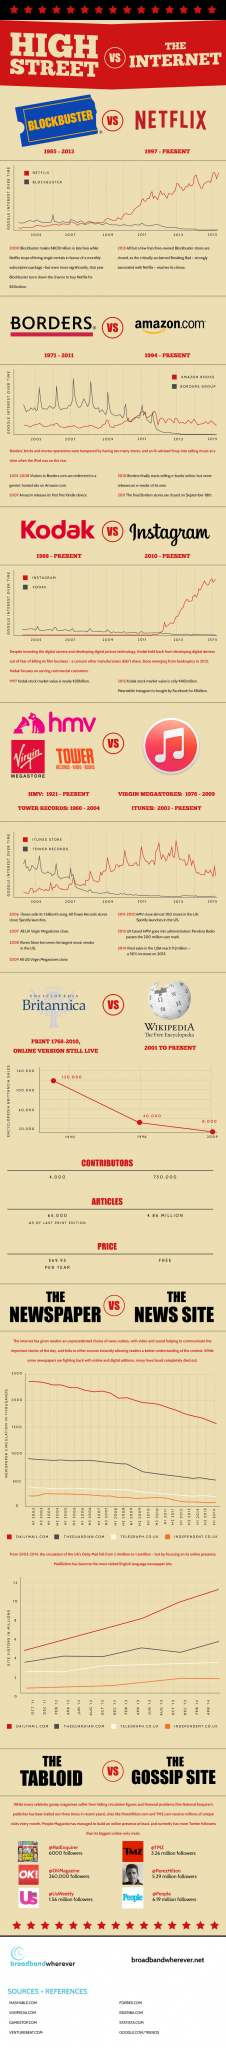 high street vs internet